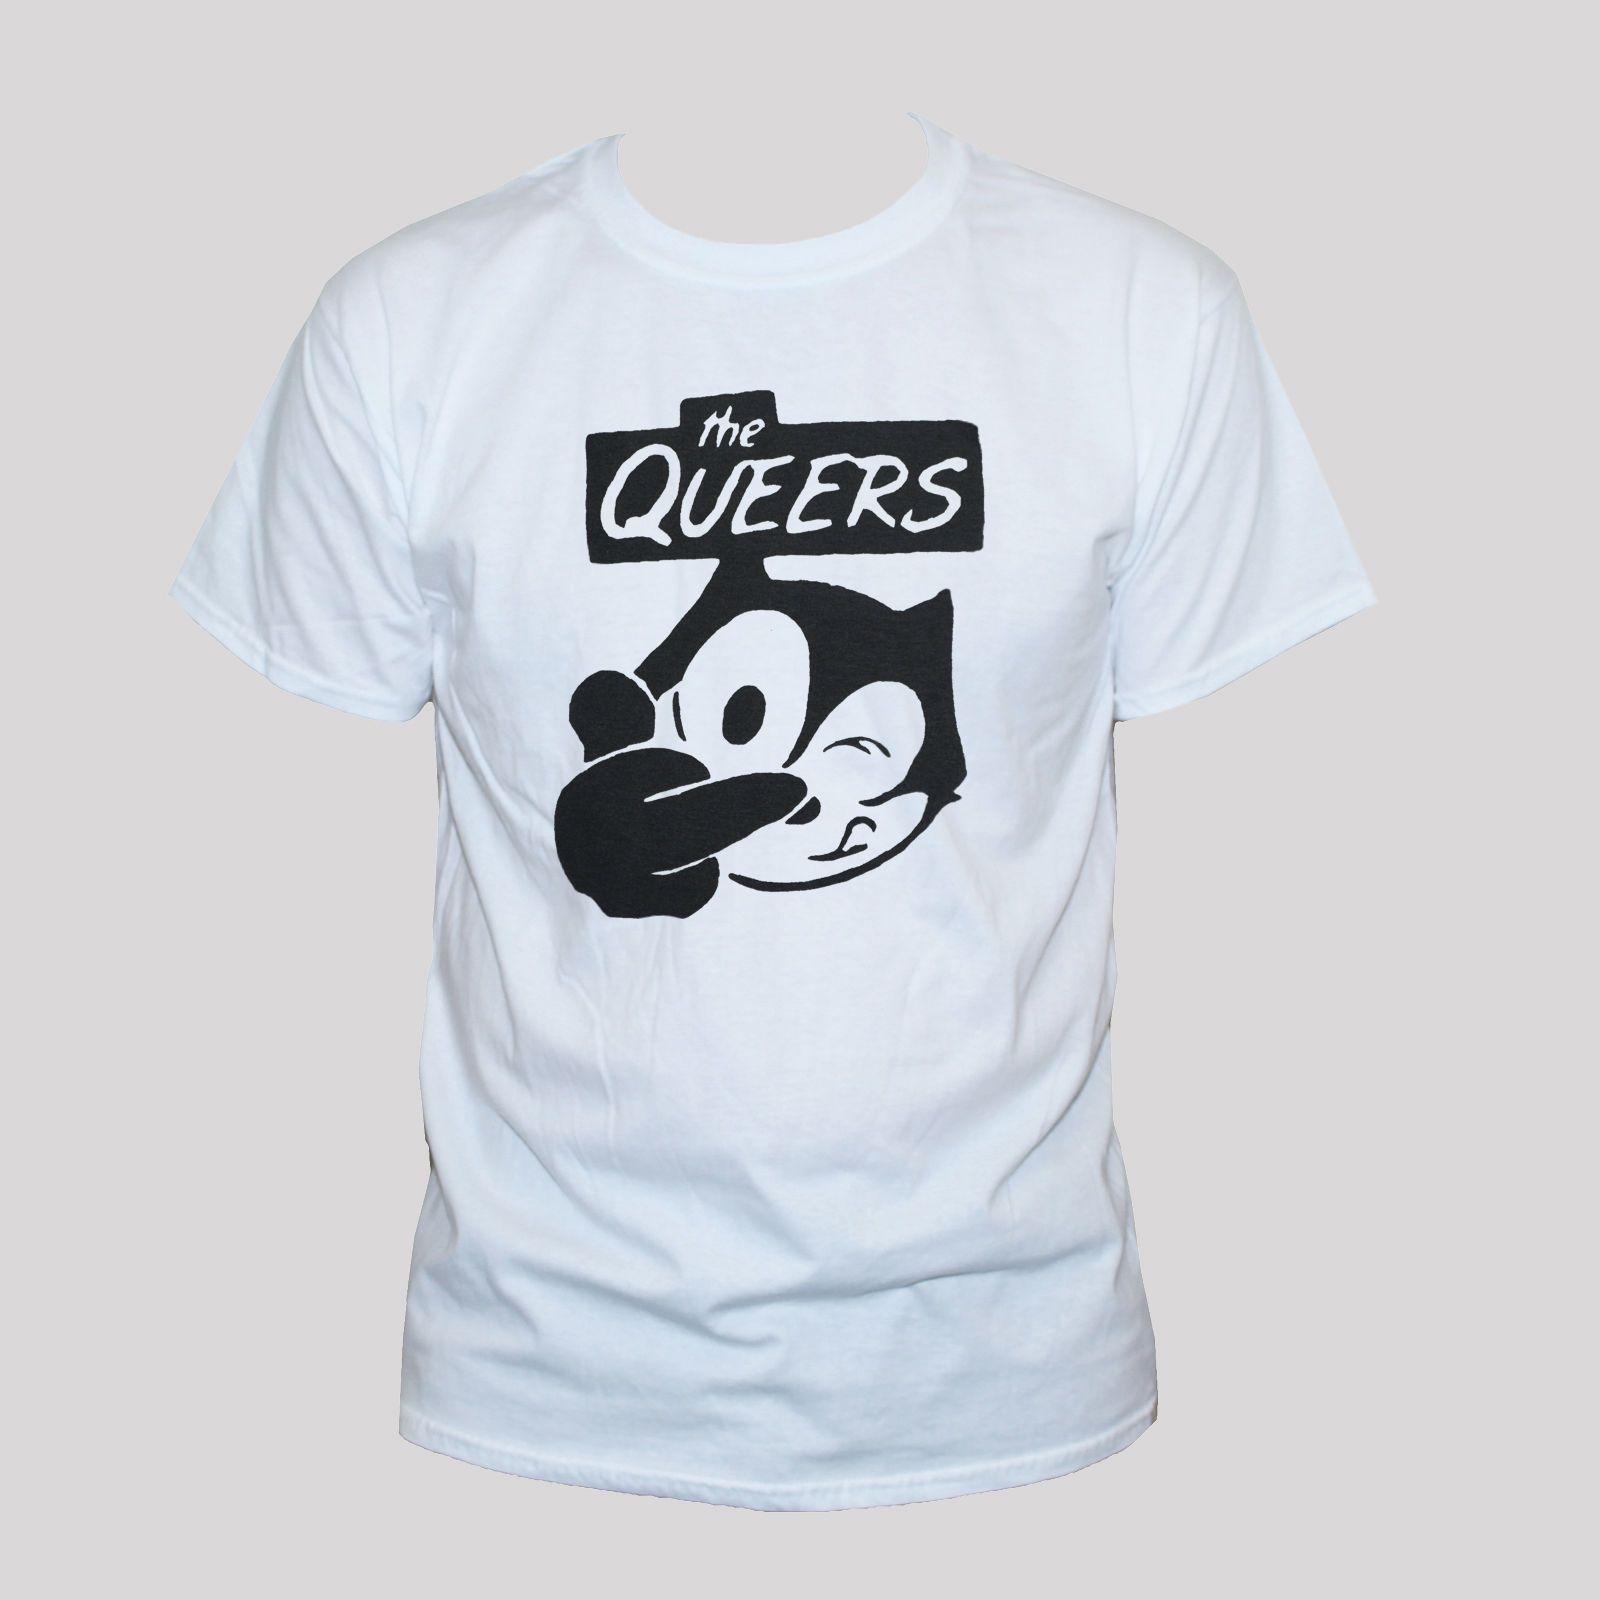 9a1bddf86 Compre The Queers Camiseta Punk Rock Ramones Teen Idols Banda Gráfica  Camiseta S M L Xl Xxl A  24.2 Del Aringstore